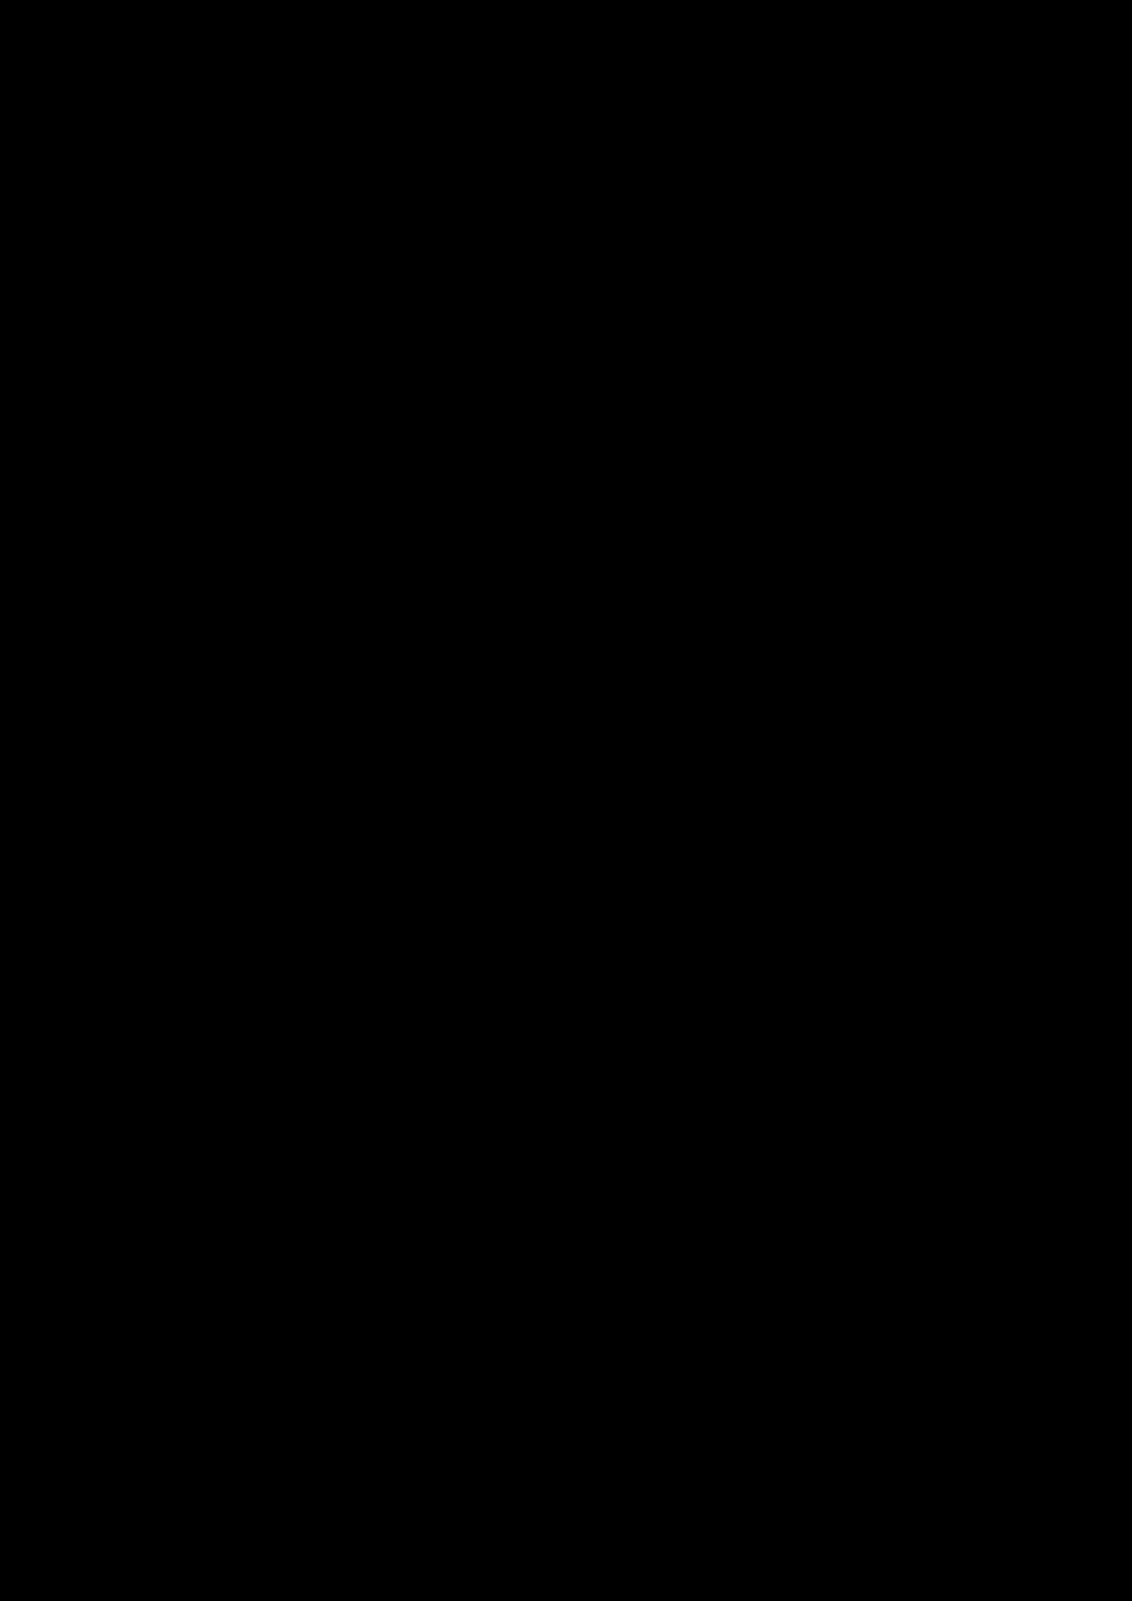 Belyiy sokol slide, Image 25